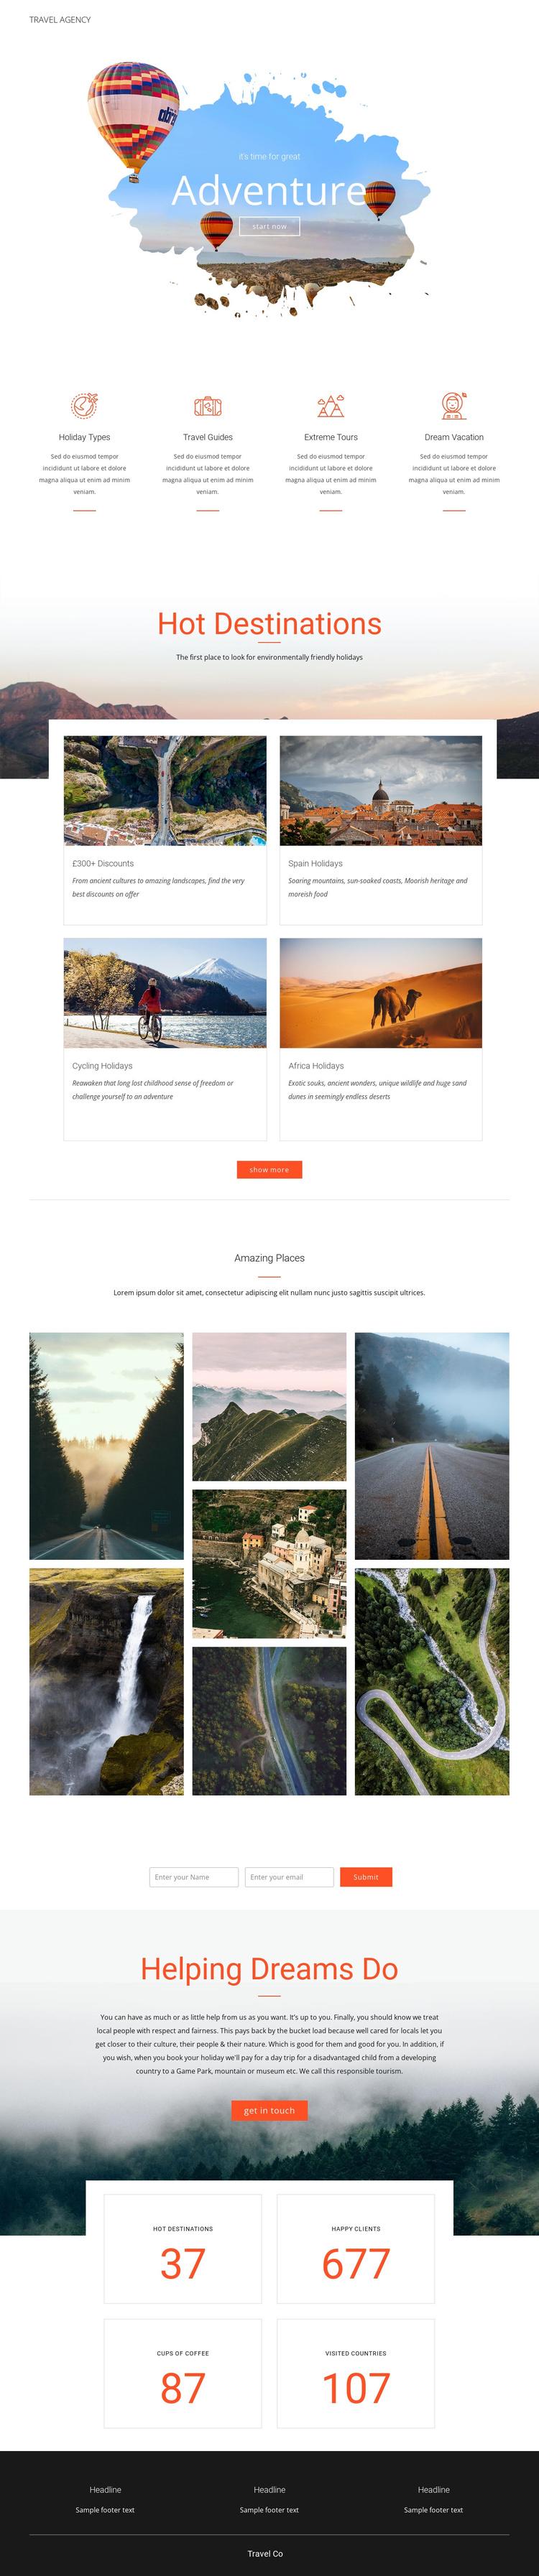 Adventure tours and travel Joomla Template